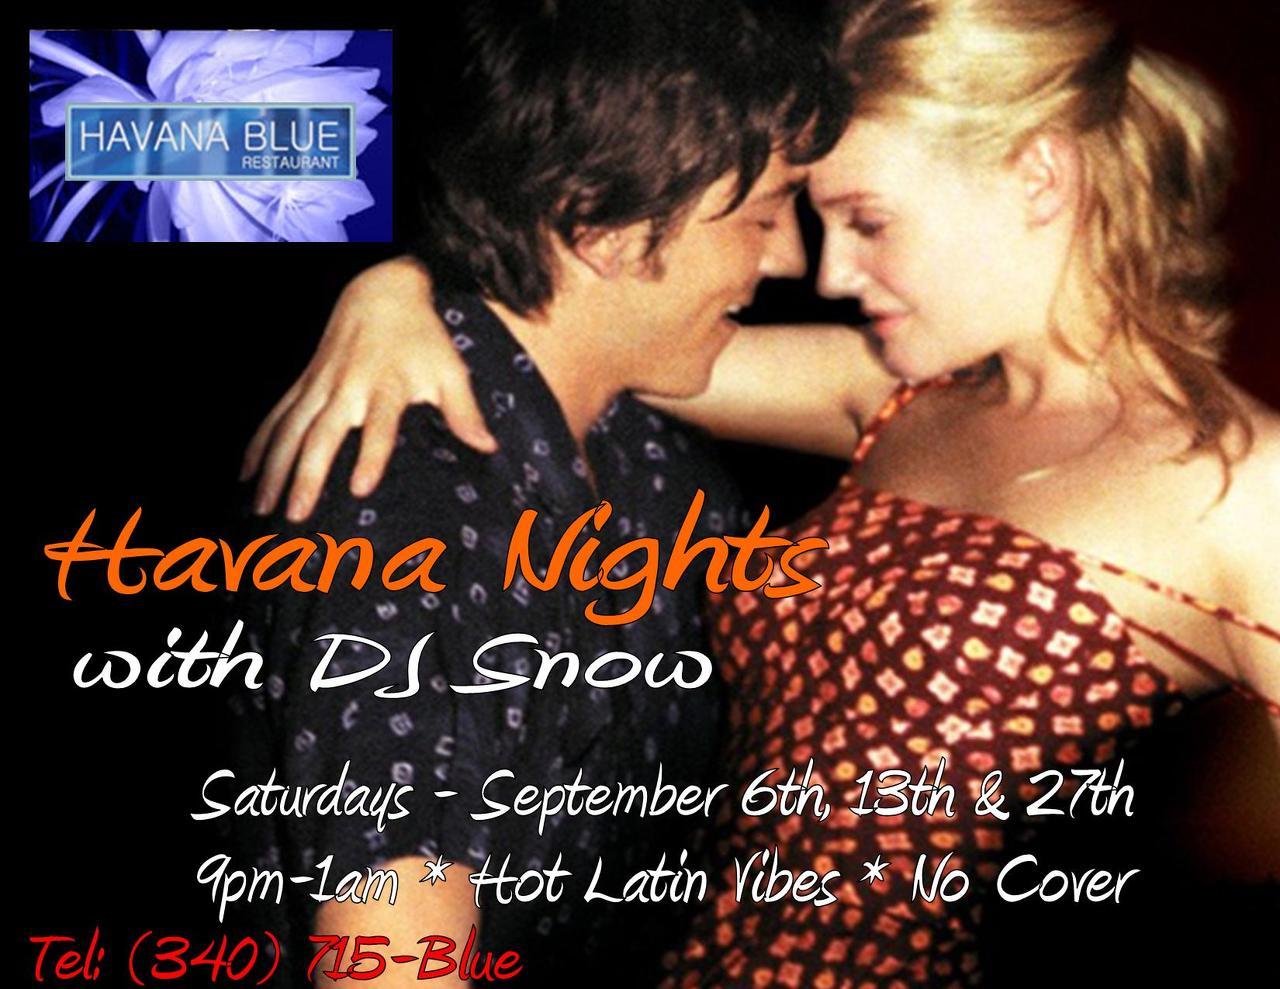 havana+nights.jpg